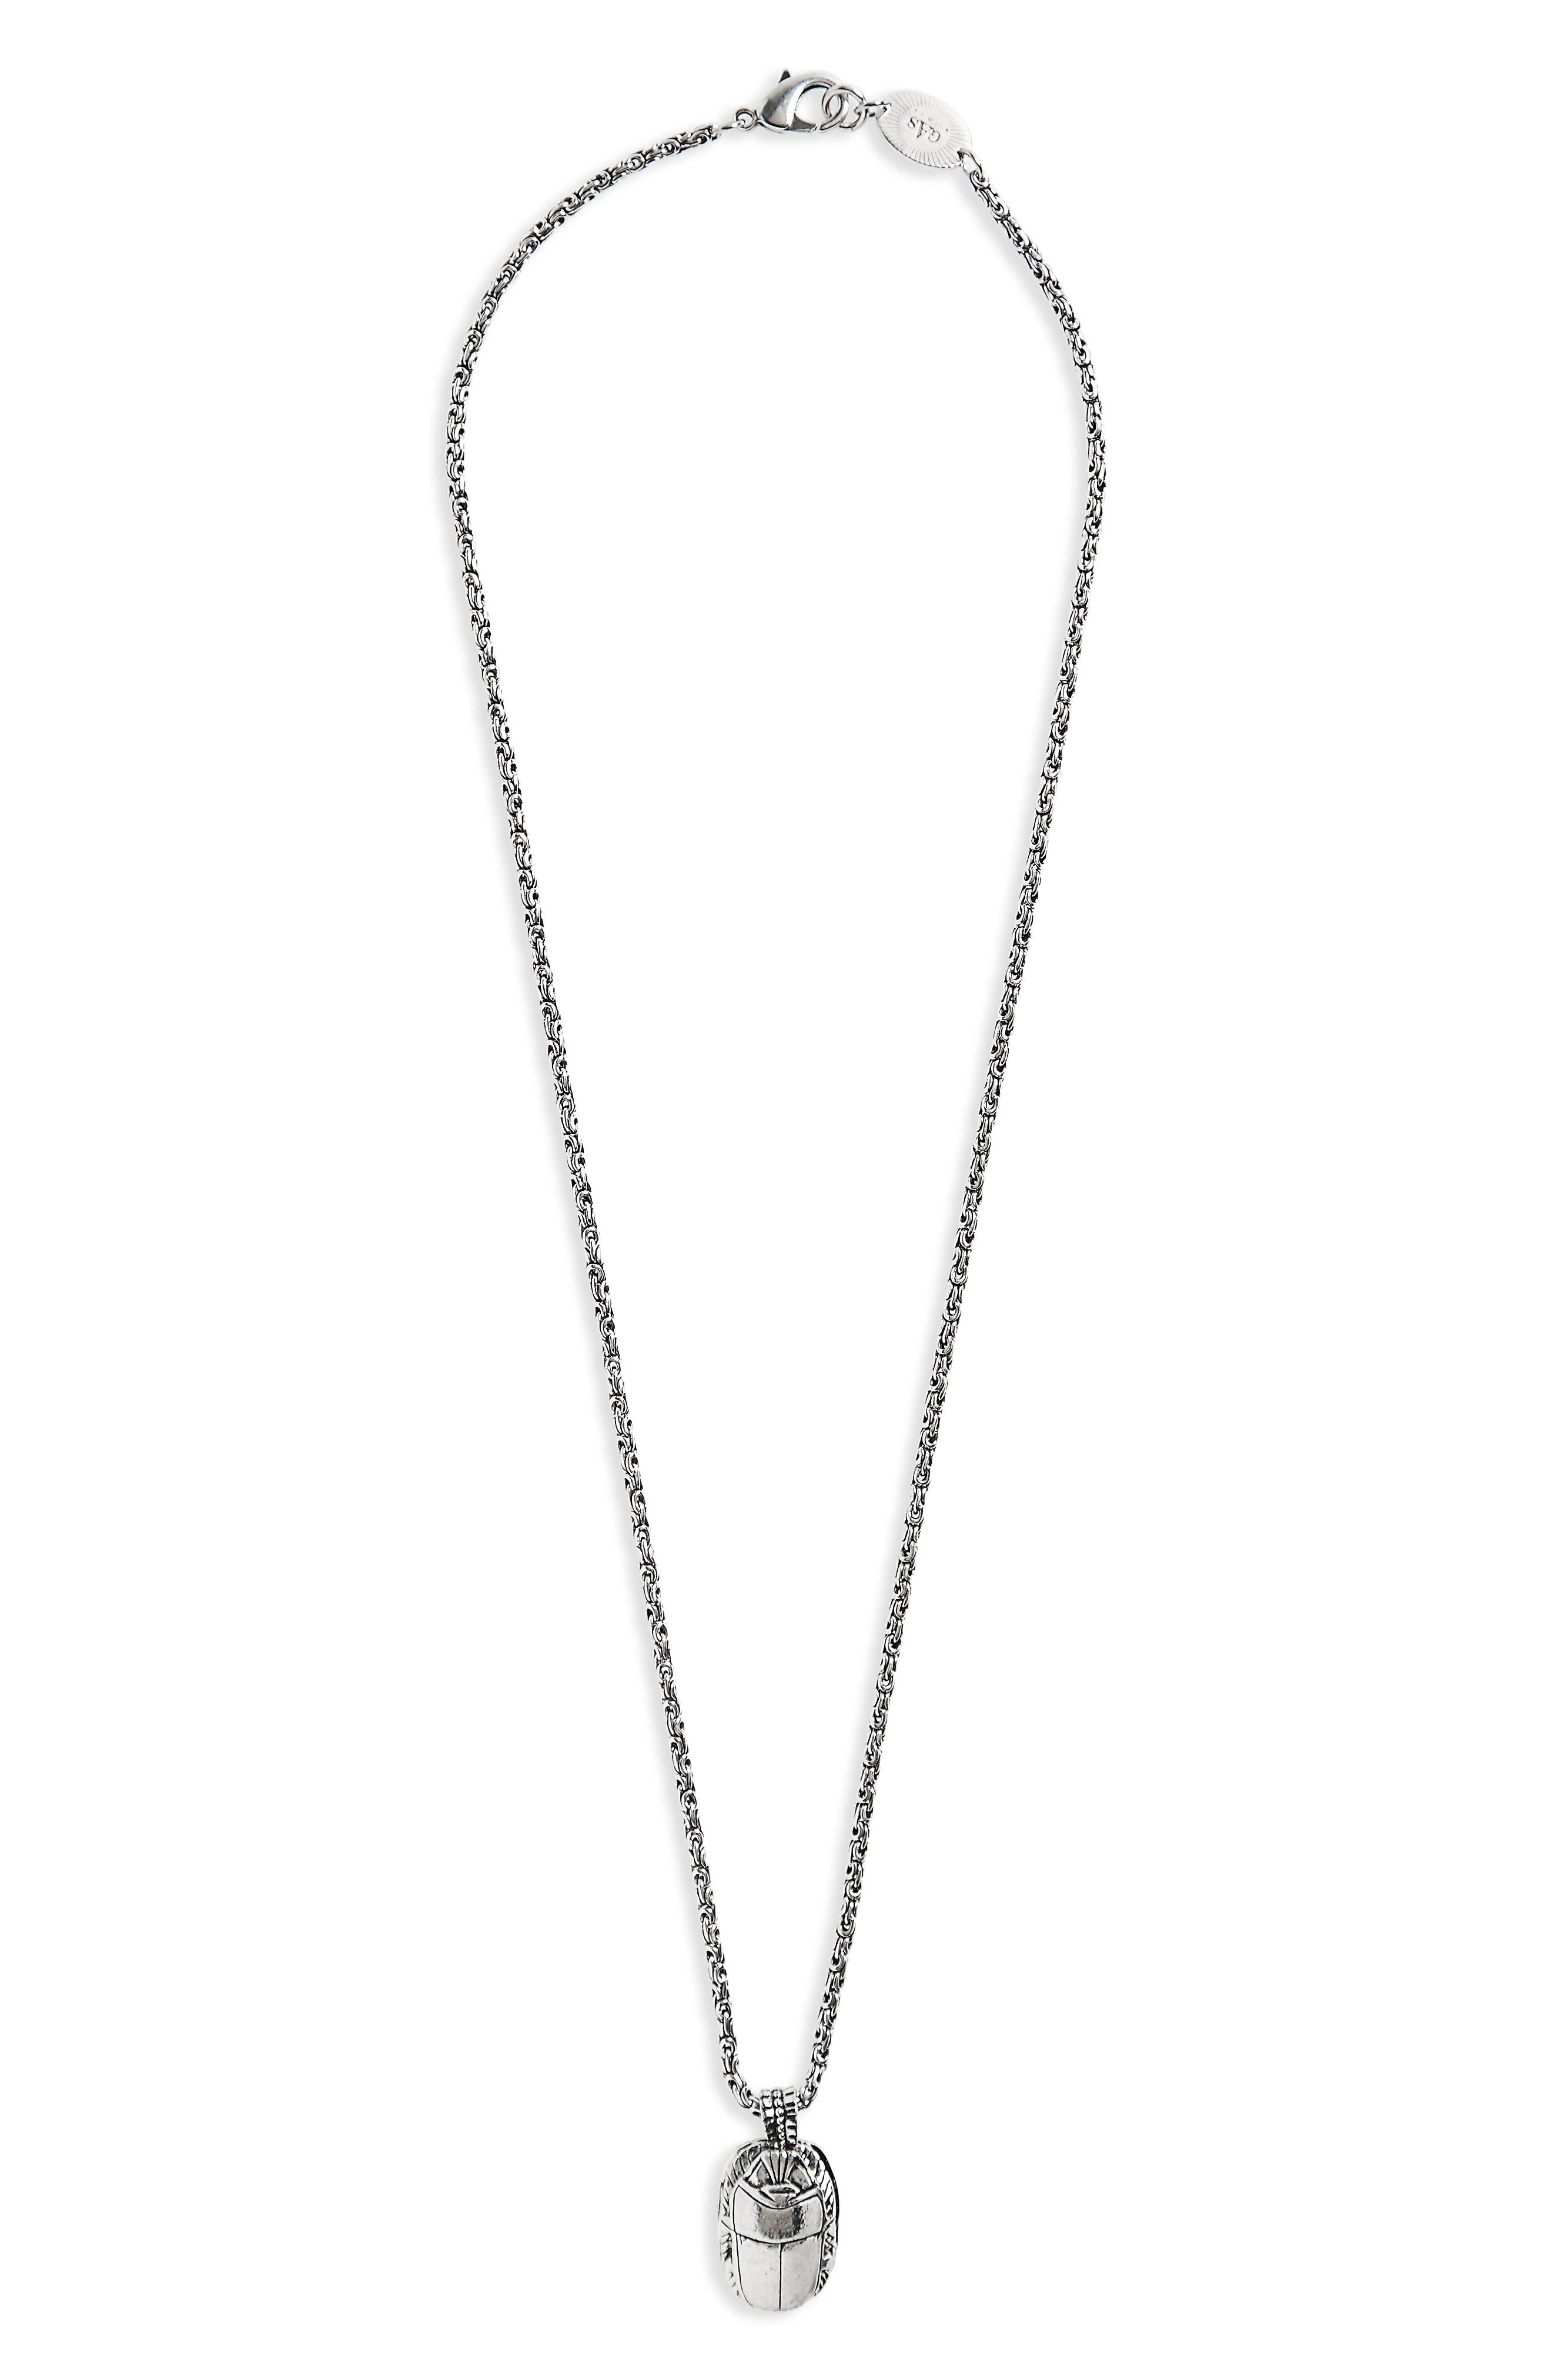 Scrabee Pendant Necklace,                             Main thumbnail 1, color,                             Silver